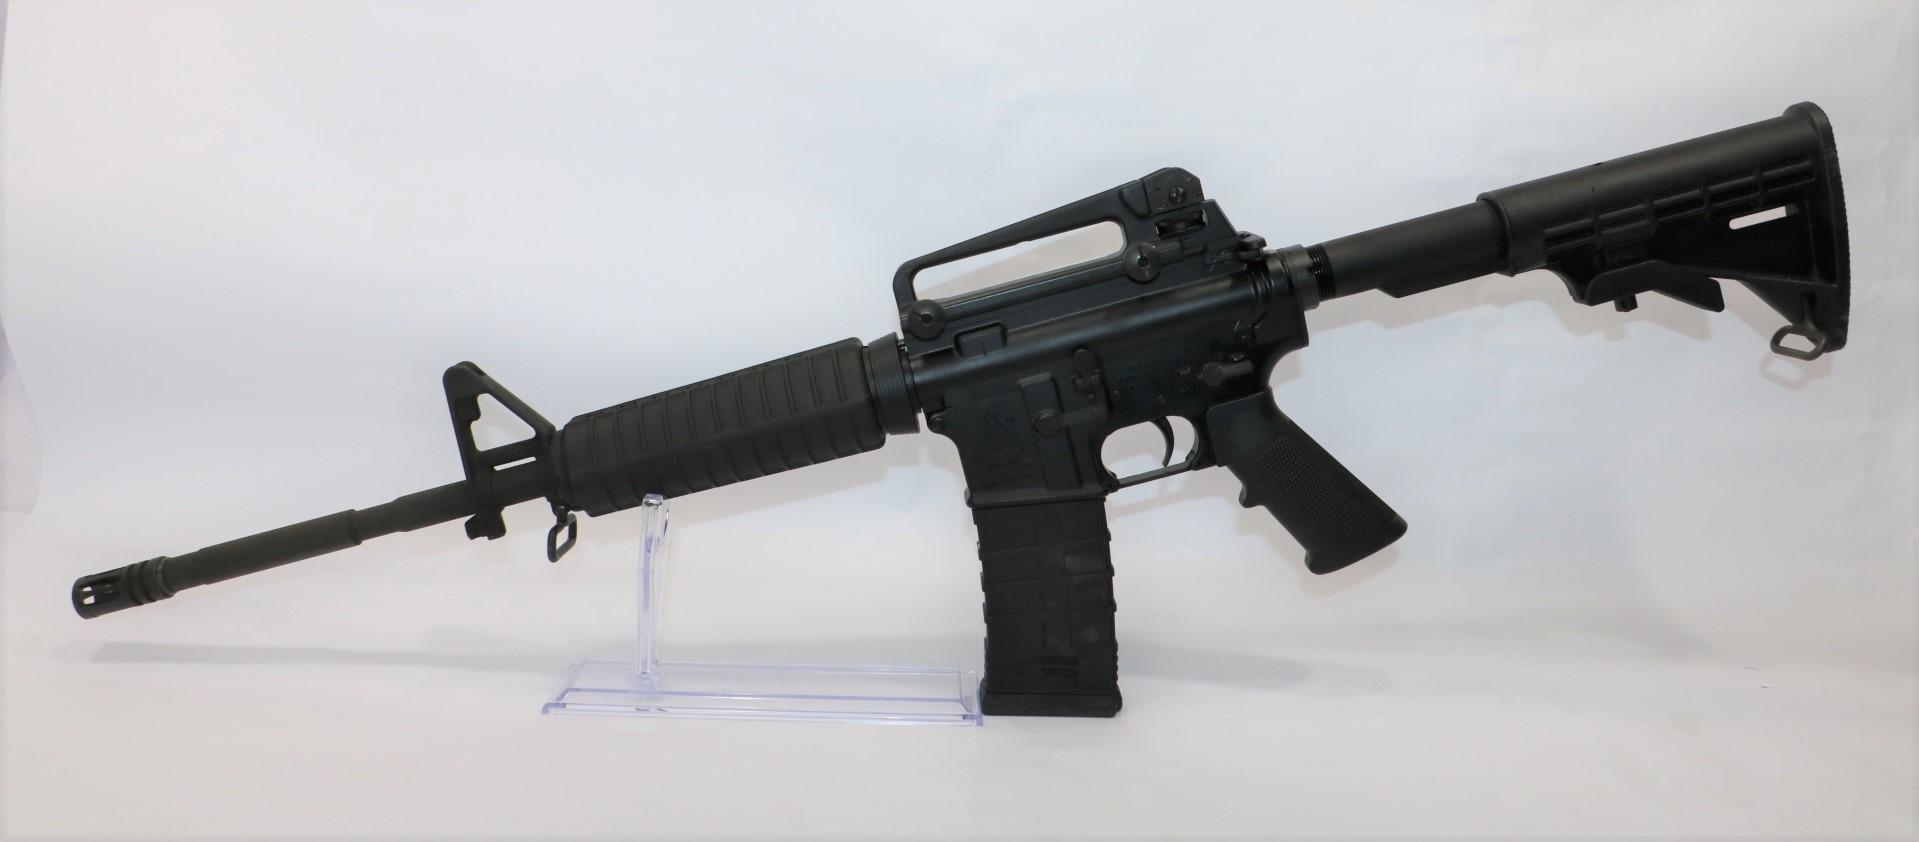 Bushmaster XM15-E2S 5.56/.223 AR15 - No Box-img-0